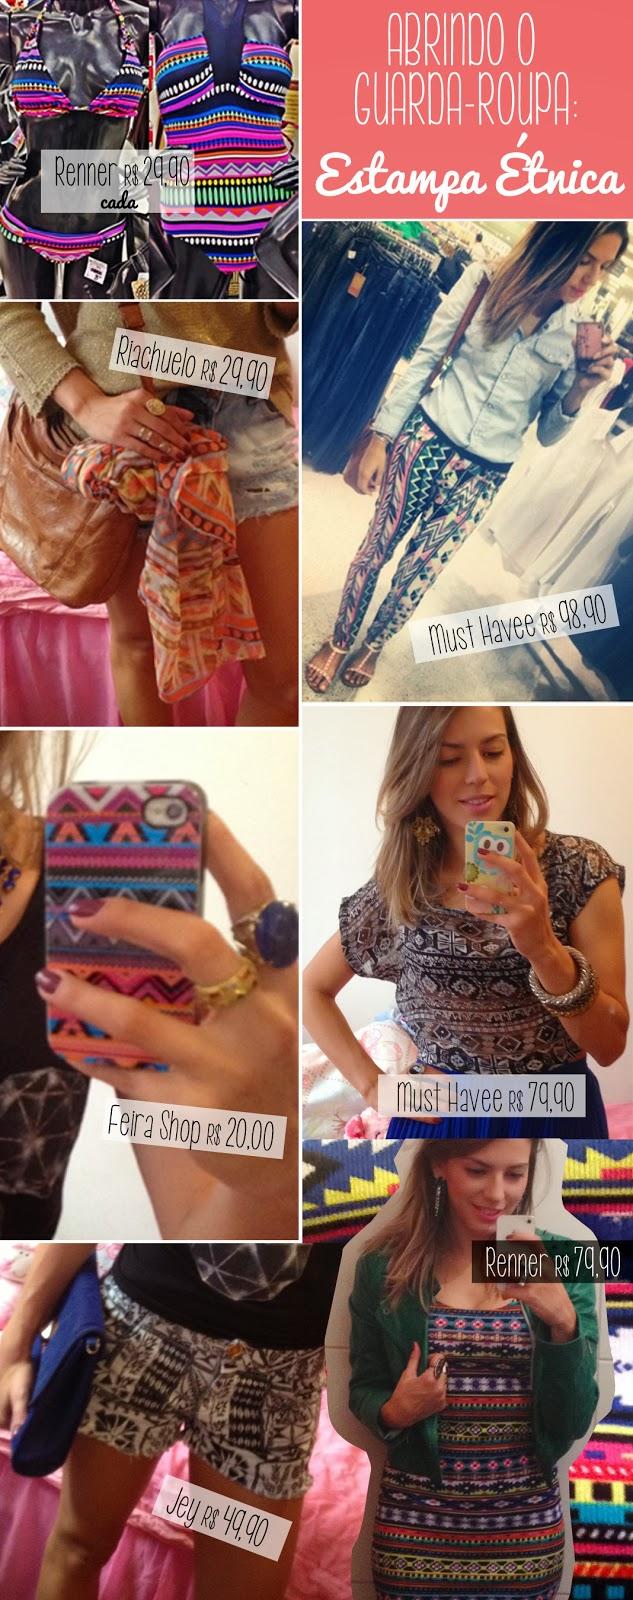 Renner, Jey, Feira Shop, moda, look, tendência, foto, estilo, riachuelo